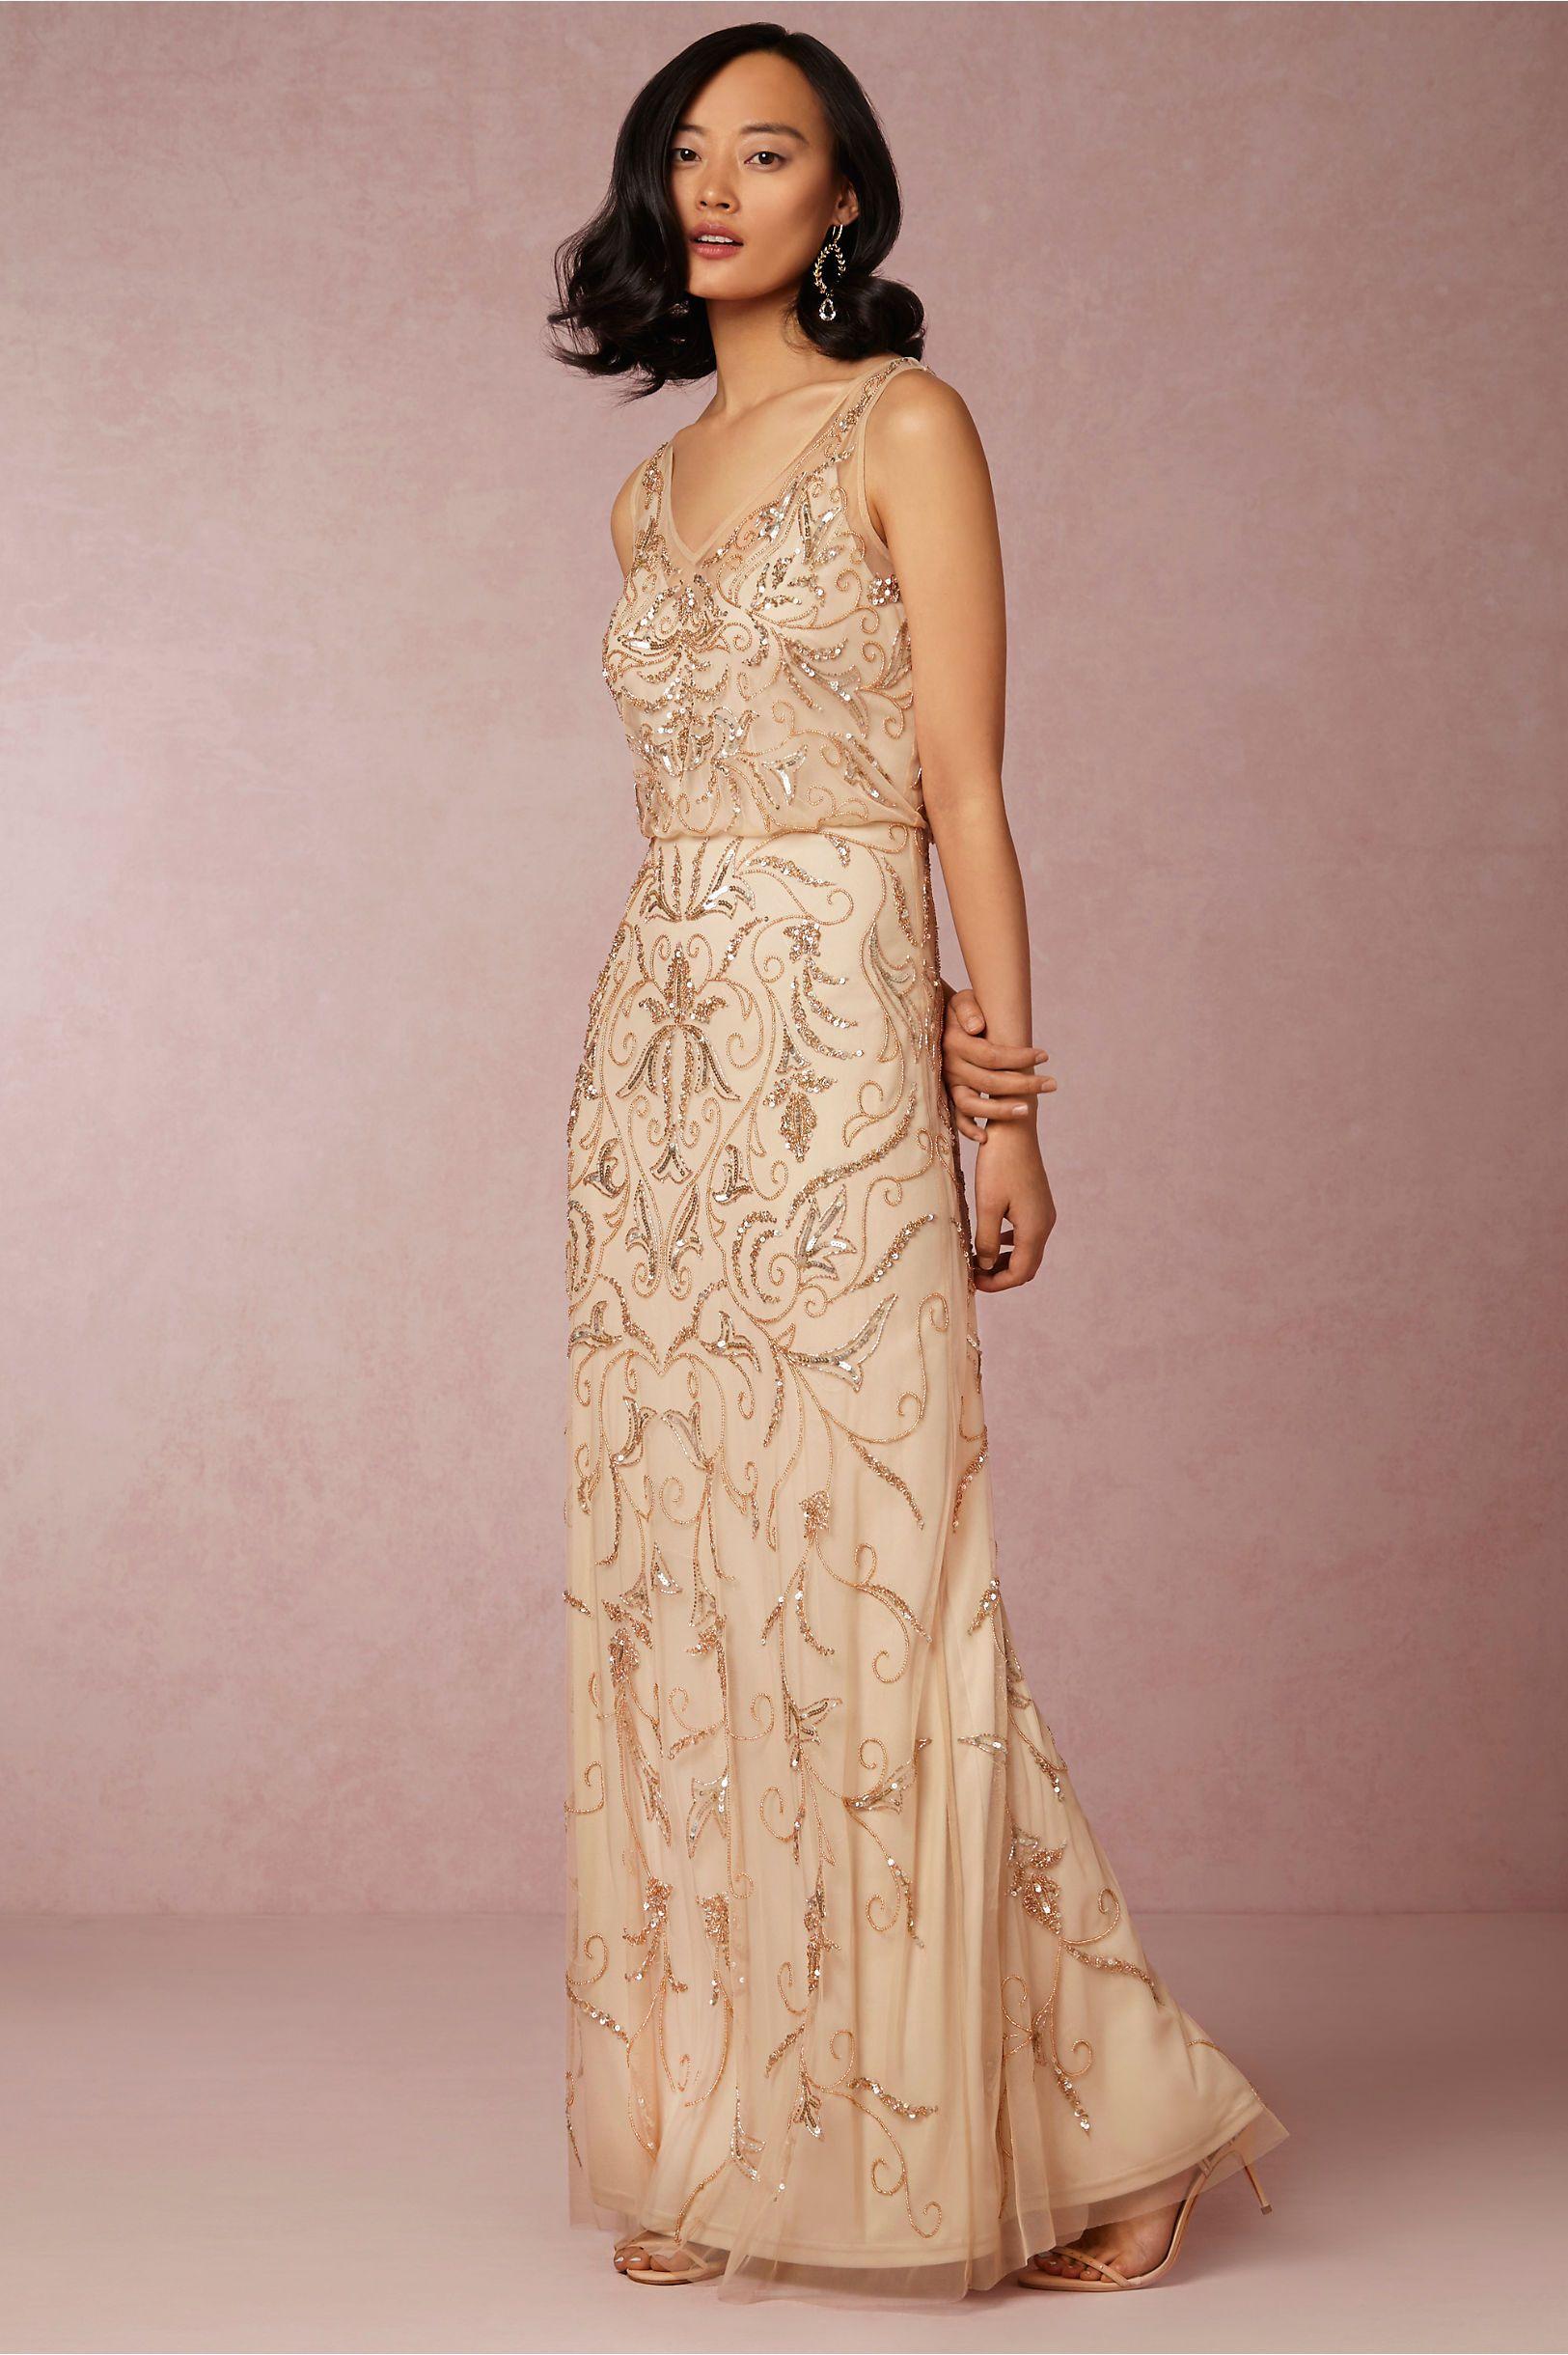 Vintage wedding dress under 500  Ascott Dress in New at BHLDN  Vestidos de novia  Pinterest